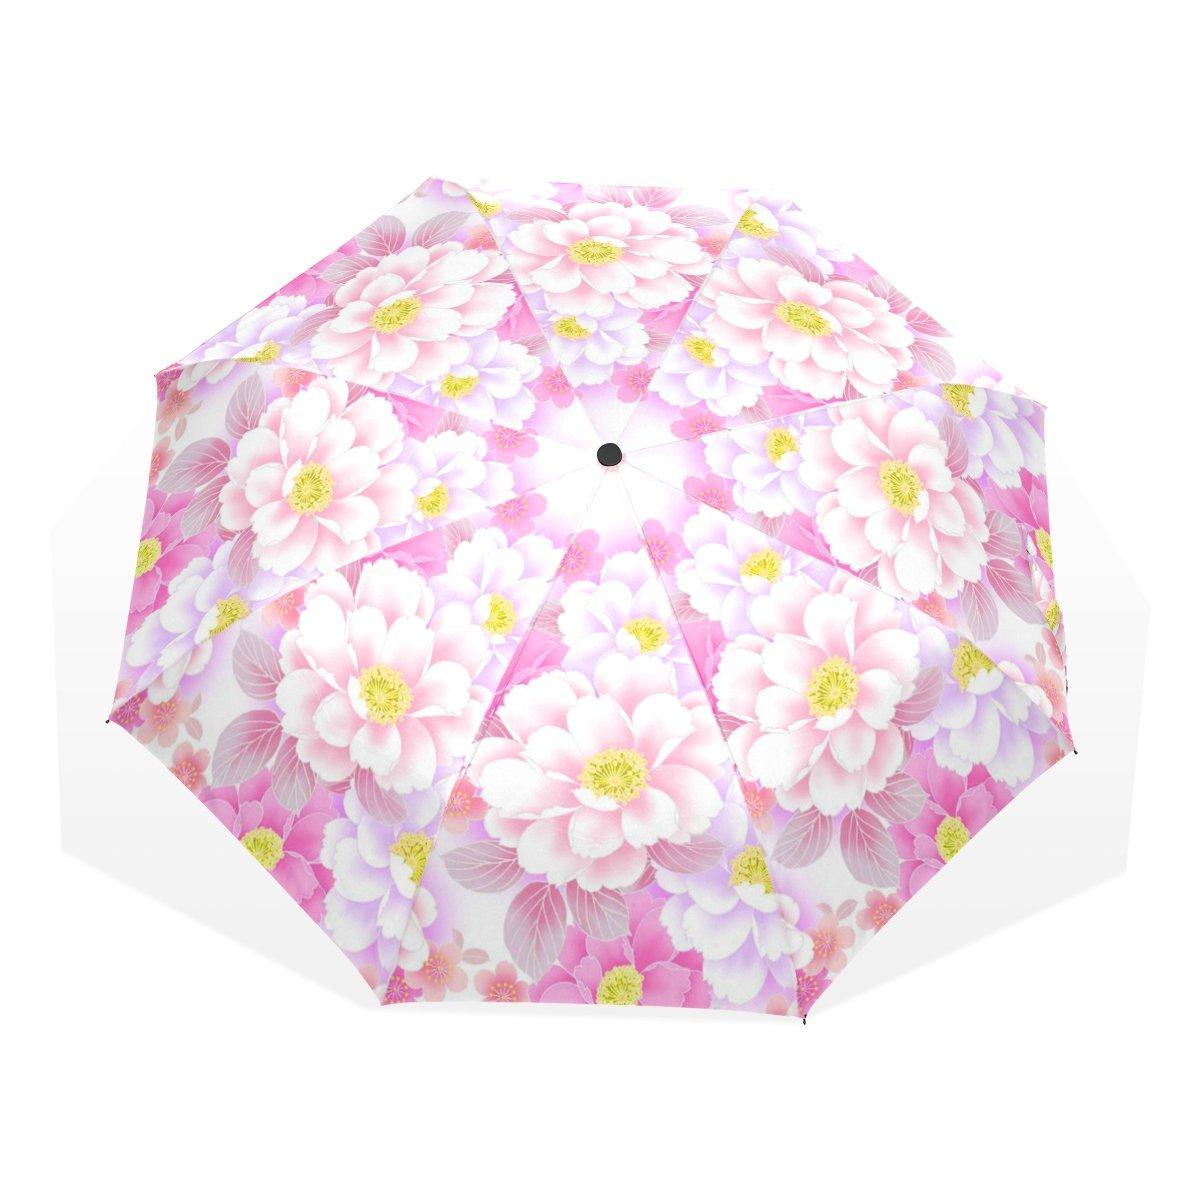 baihuishop防風ゴルフ傘、コンパクトで旅行for Easy Carryingスポーツ雨傘 – 強力なフレーム壊れない花30パターン   B01K6VNOW8